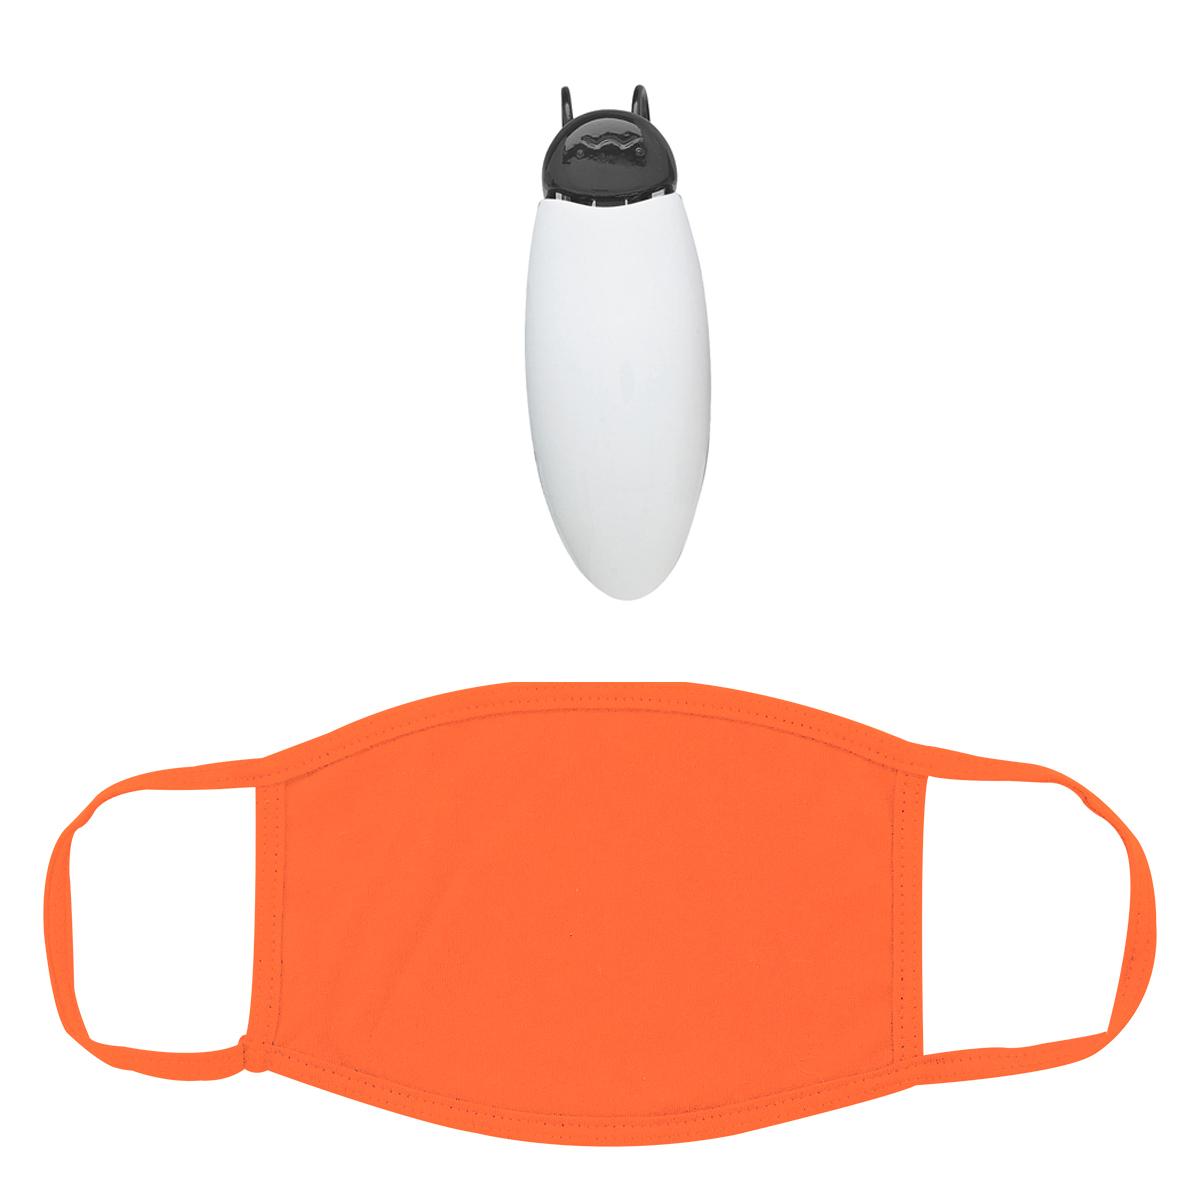 Cotton Reusable Mask With Visor Clip